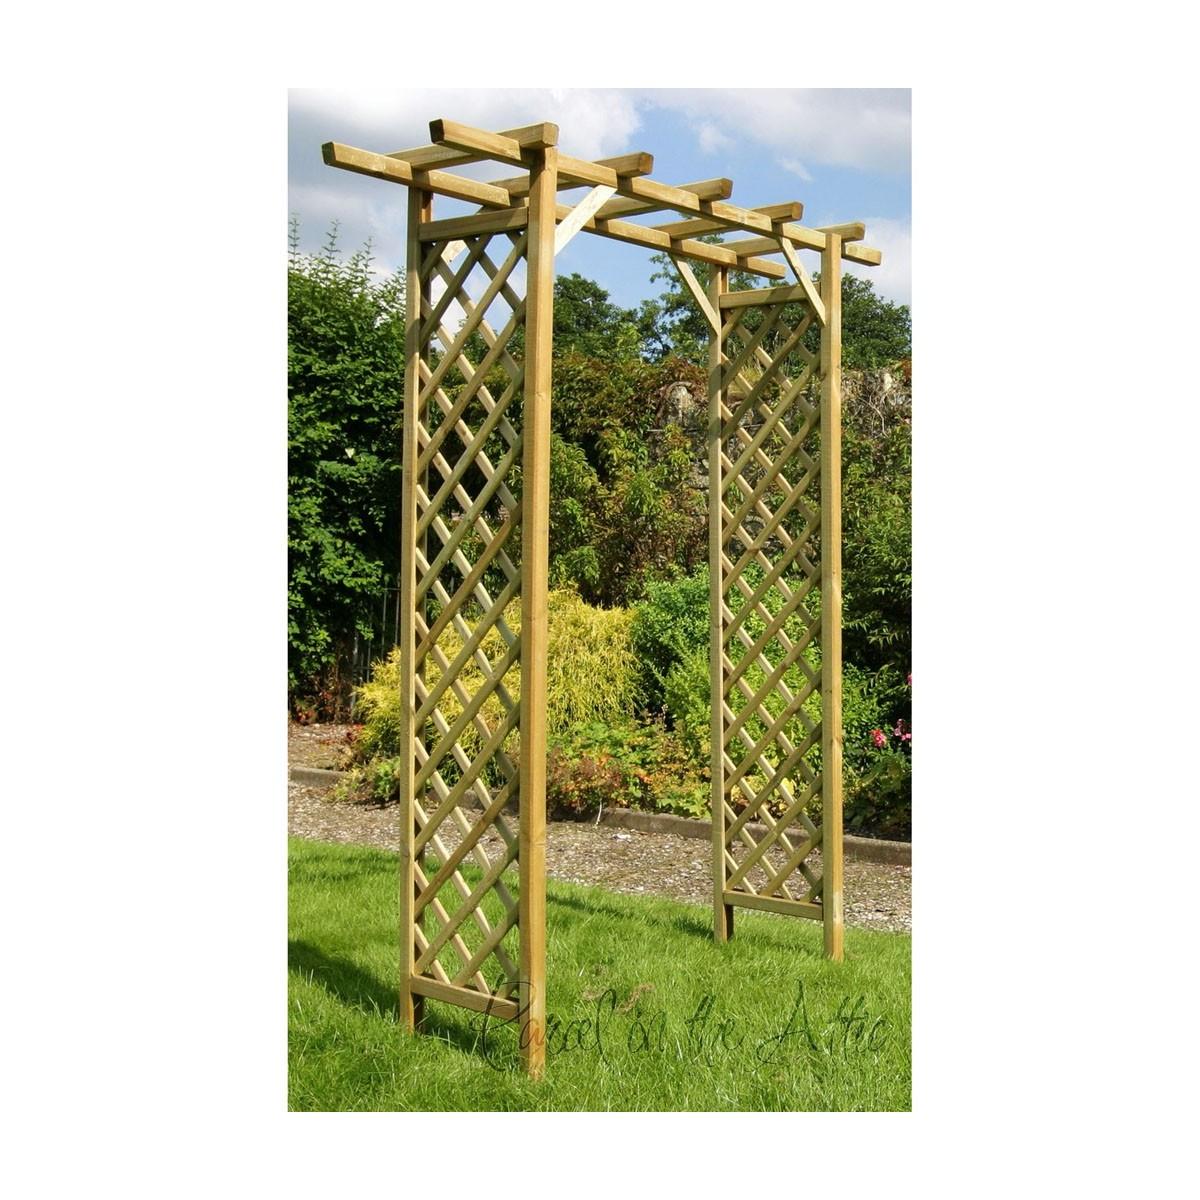 Flat Top Garden Arch with Trellis